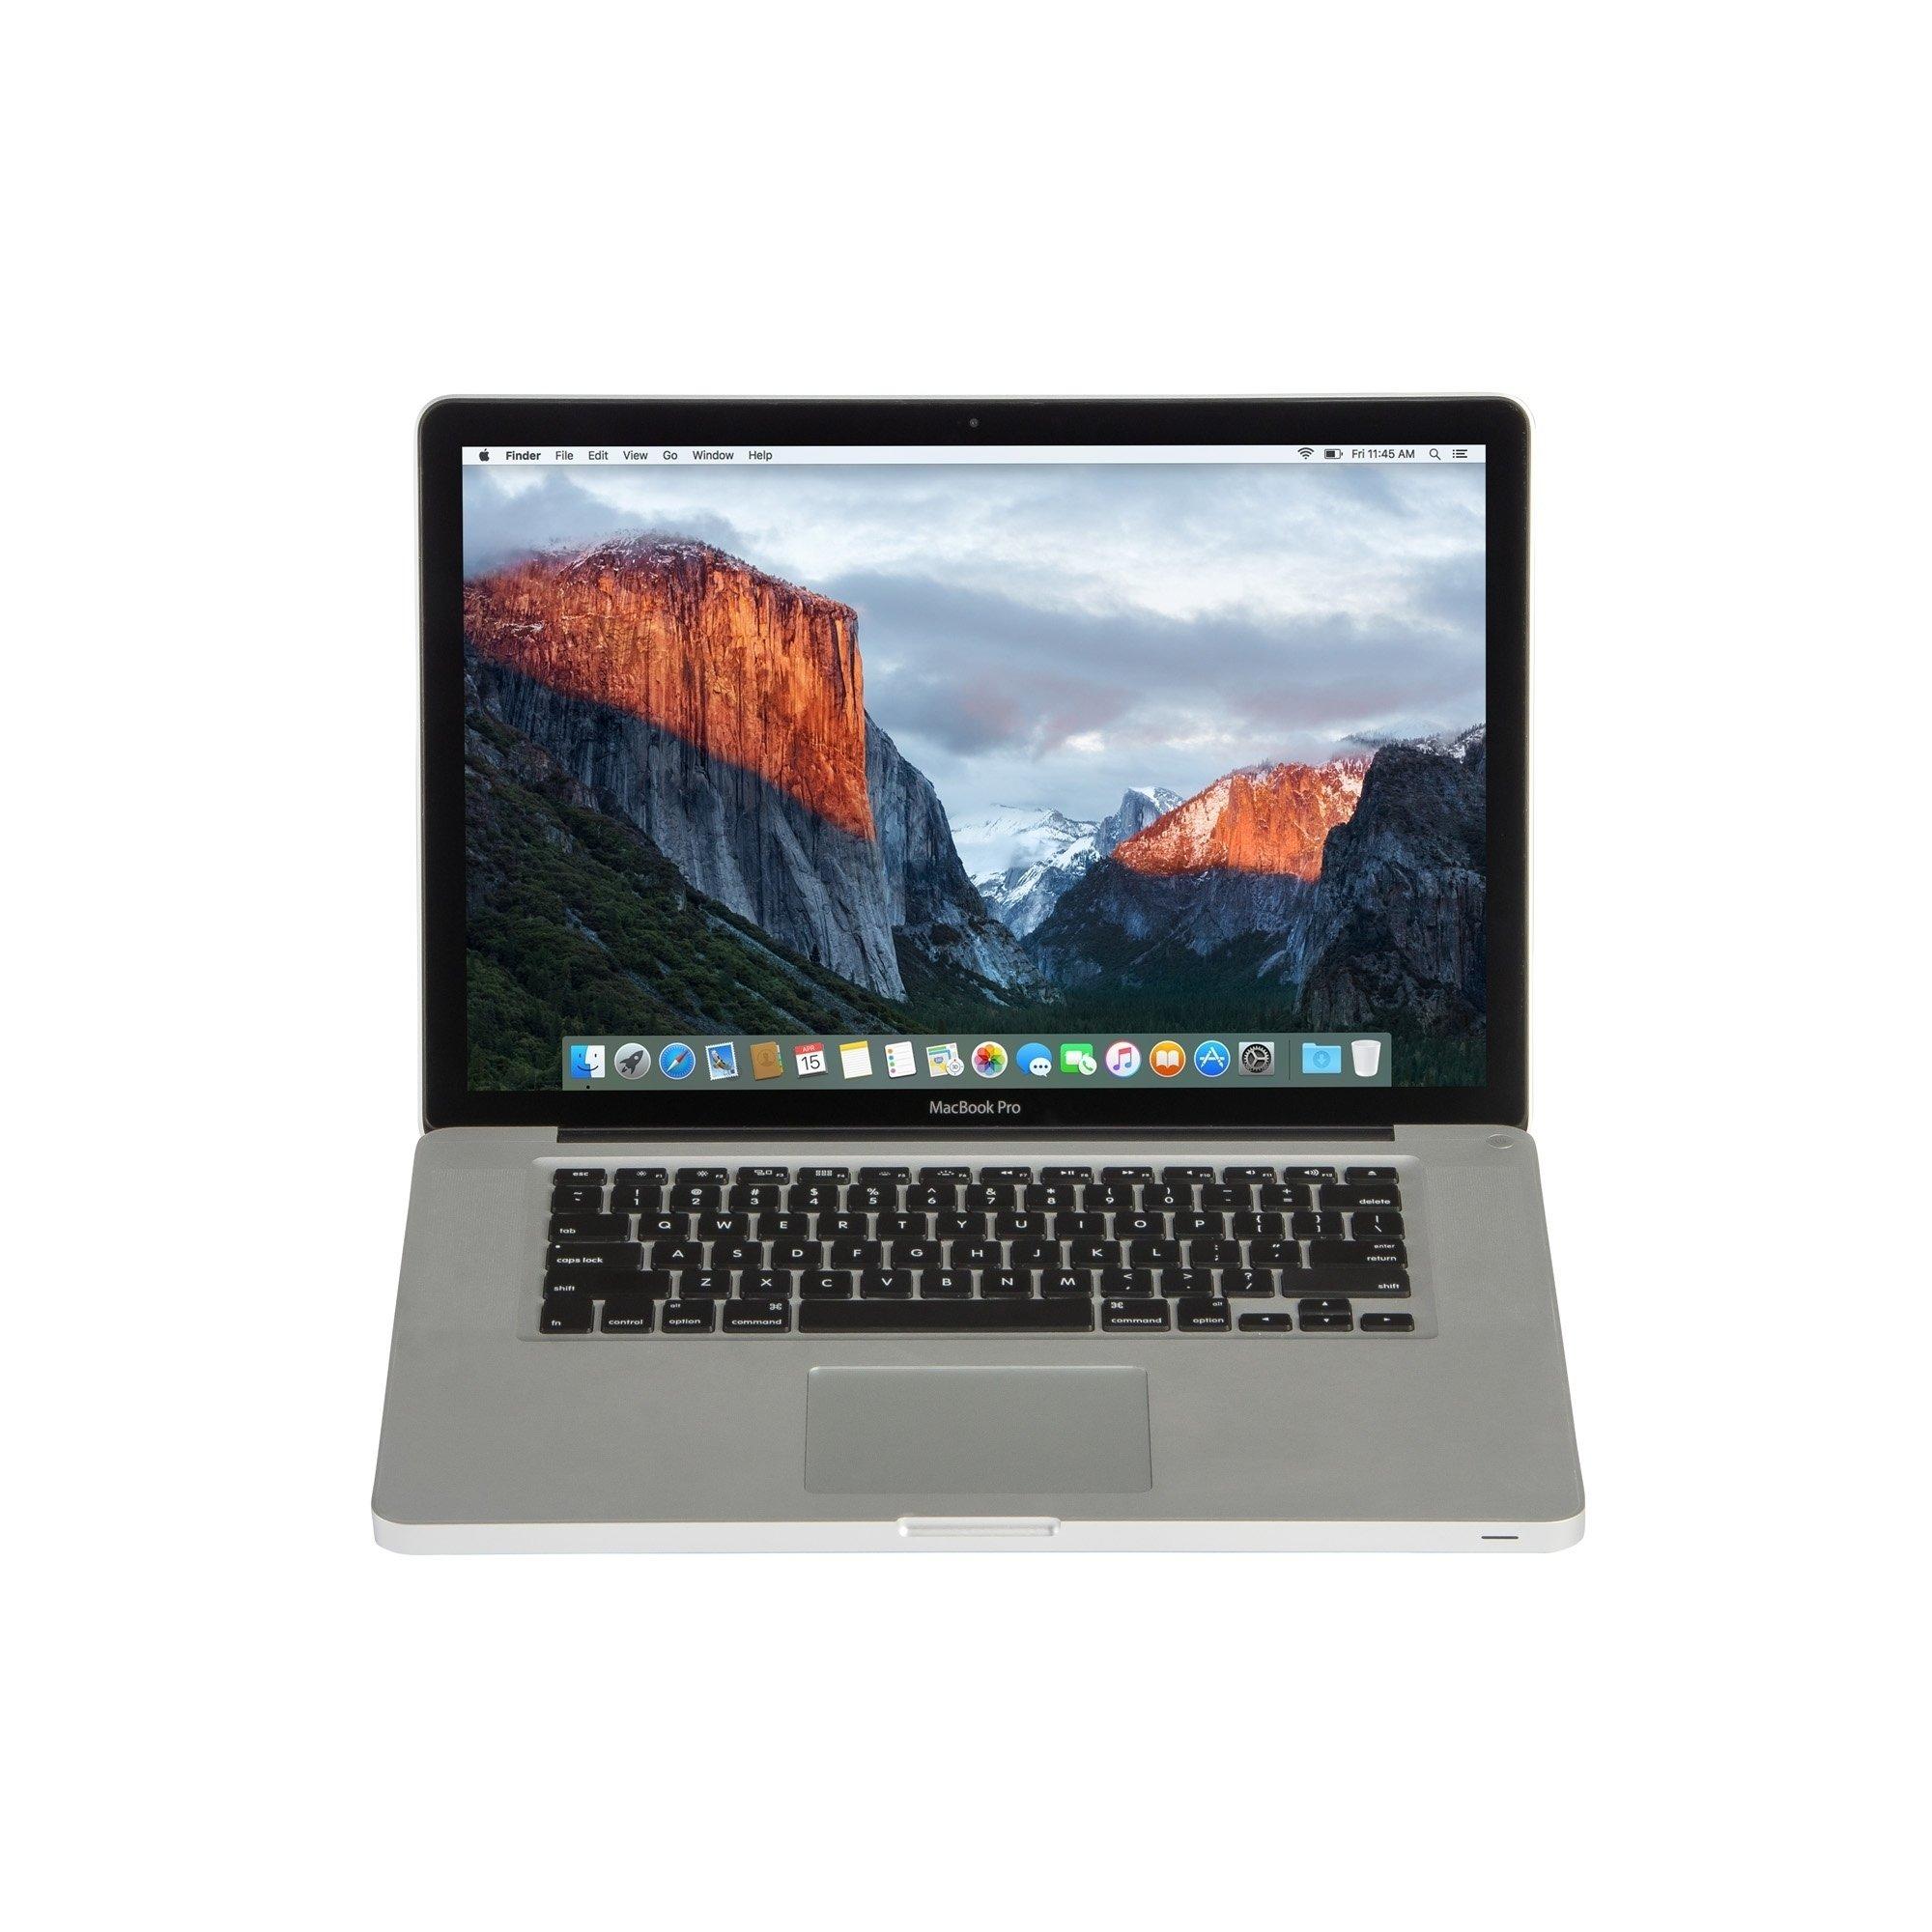 Apple MB990LL/A Macbook Pro 13.3-inch Core 2 Duo 4GB RAM 160GB HDD El Capitan – Certified Preloved